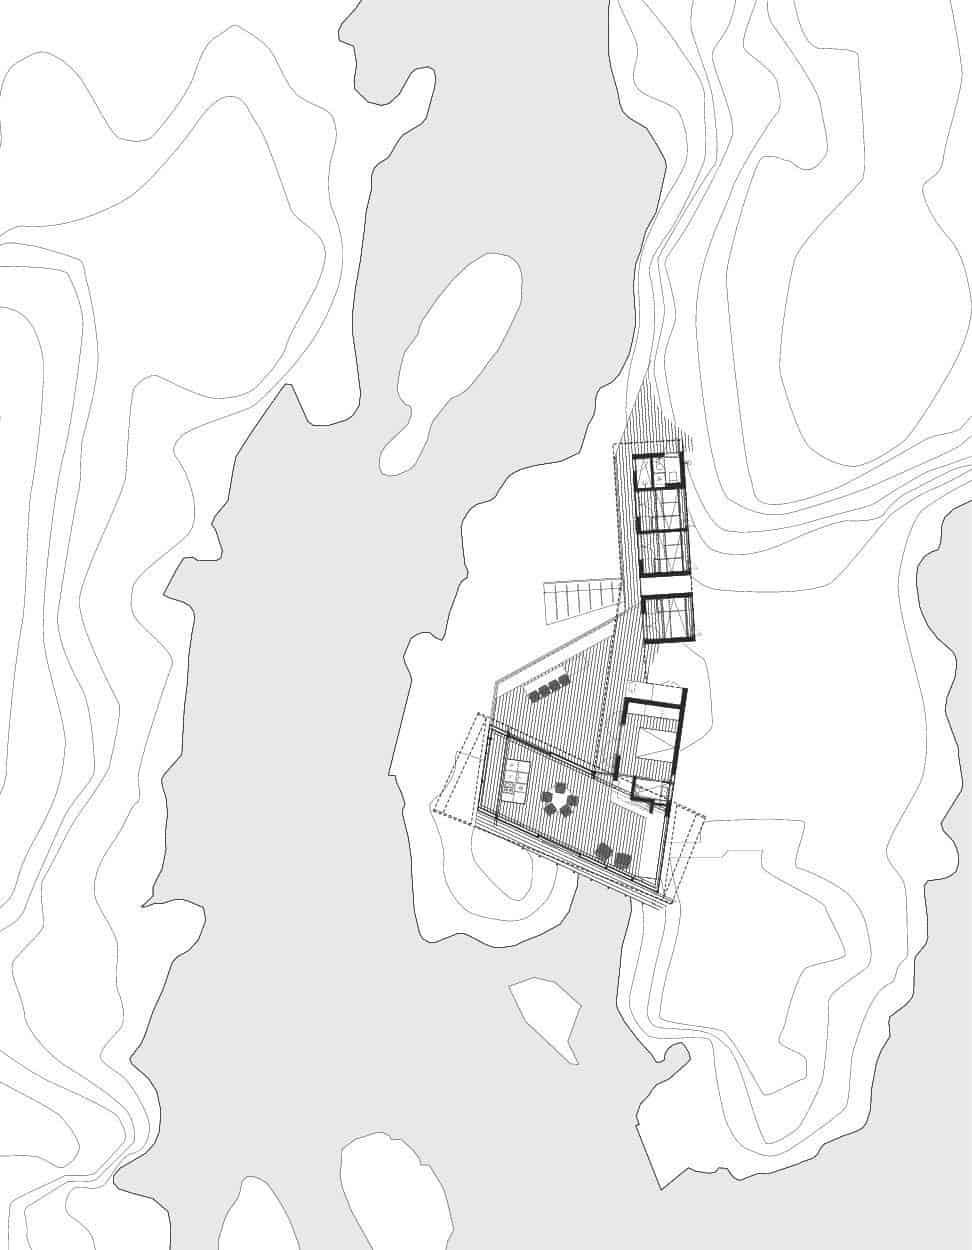 Lille Arøya by Lund Hagem (19)